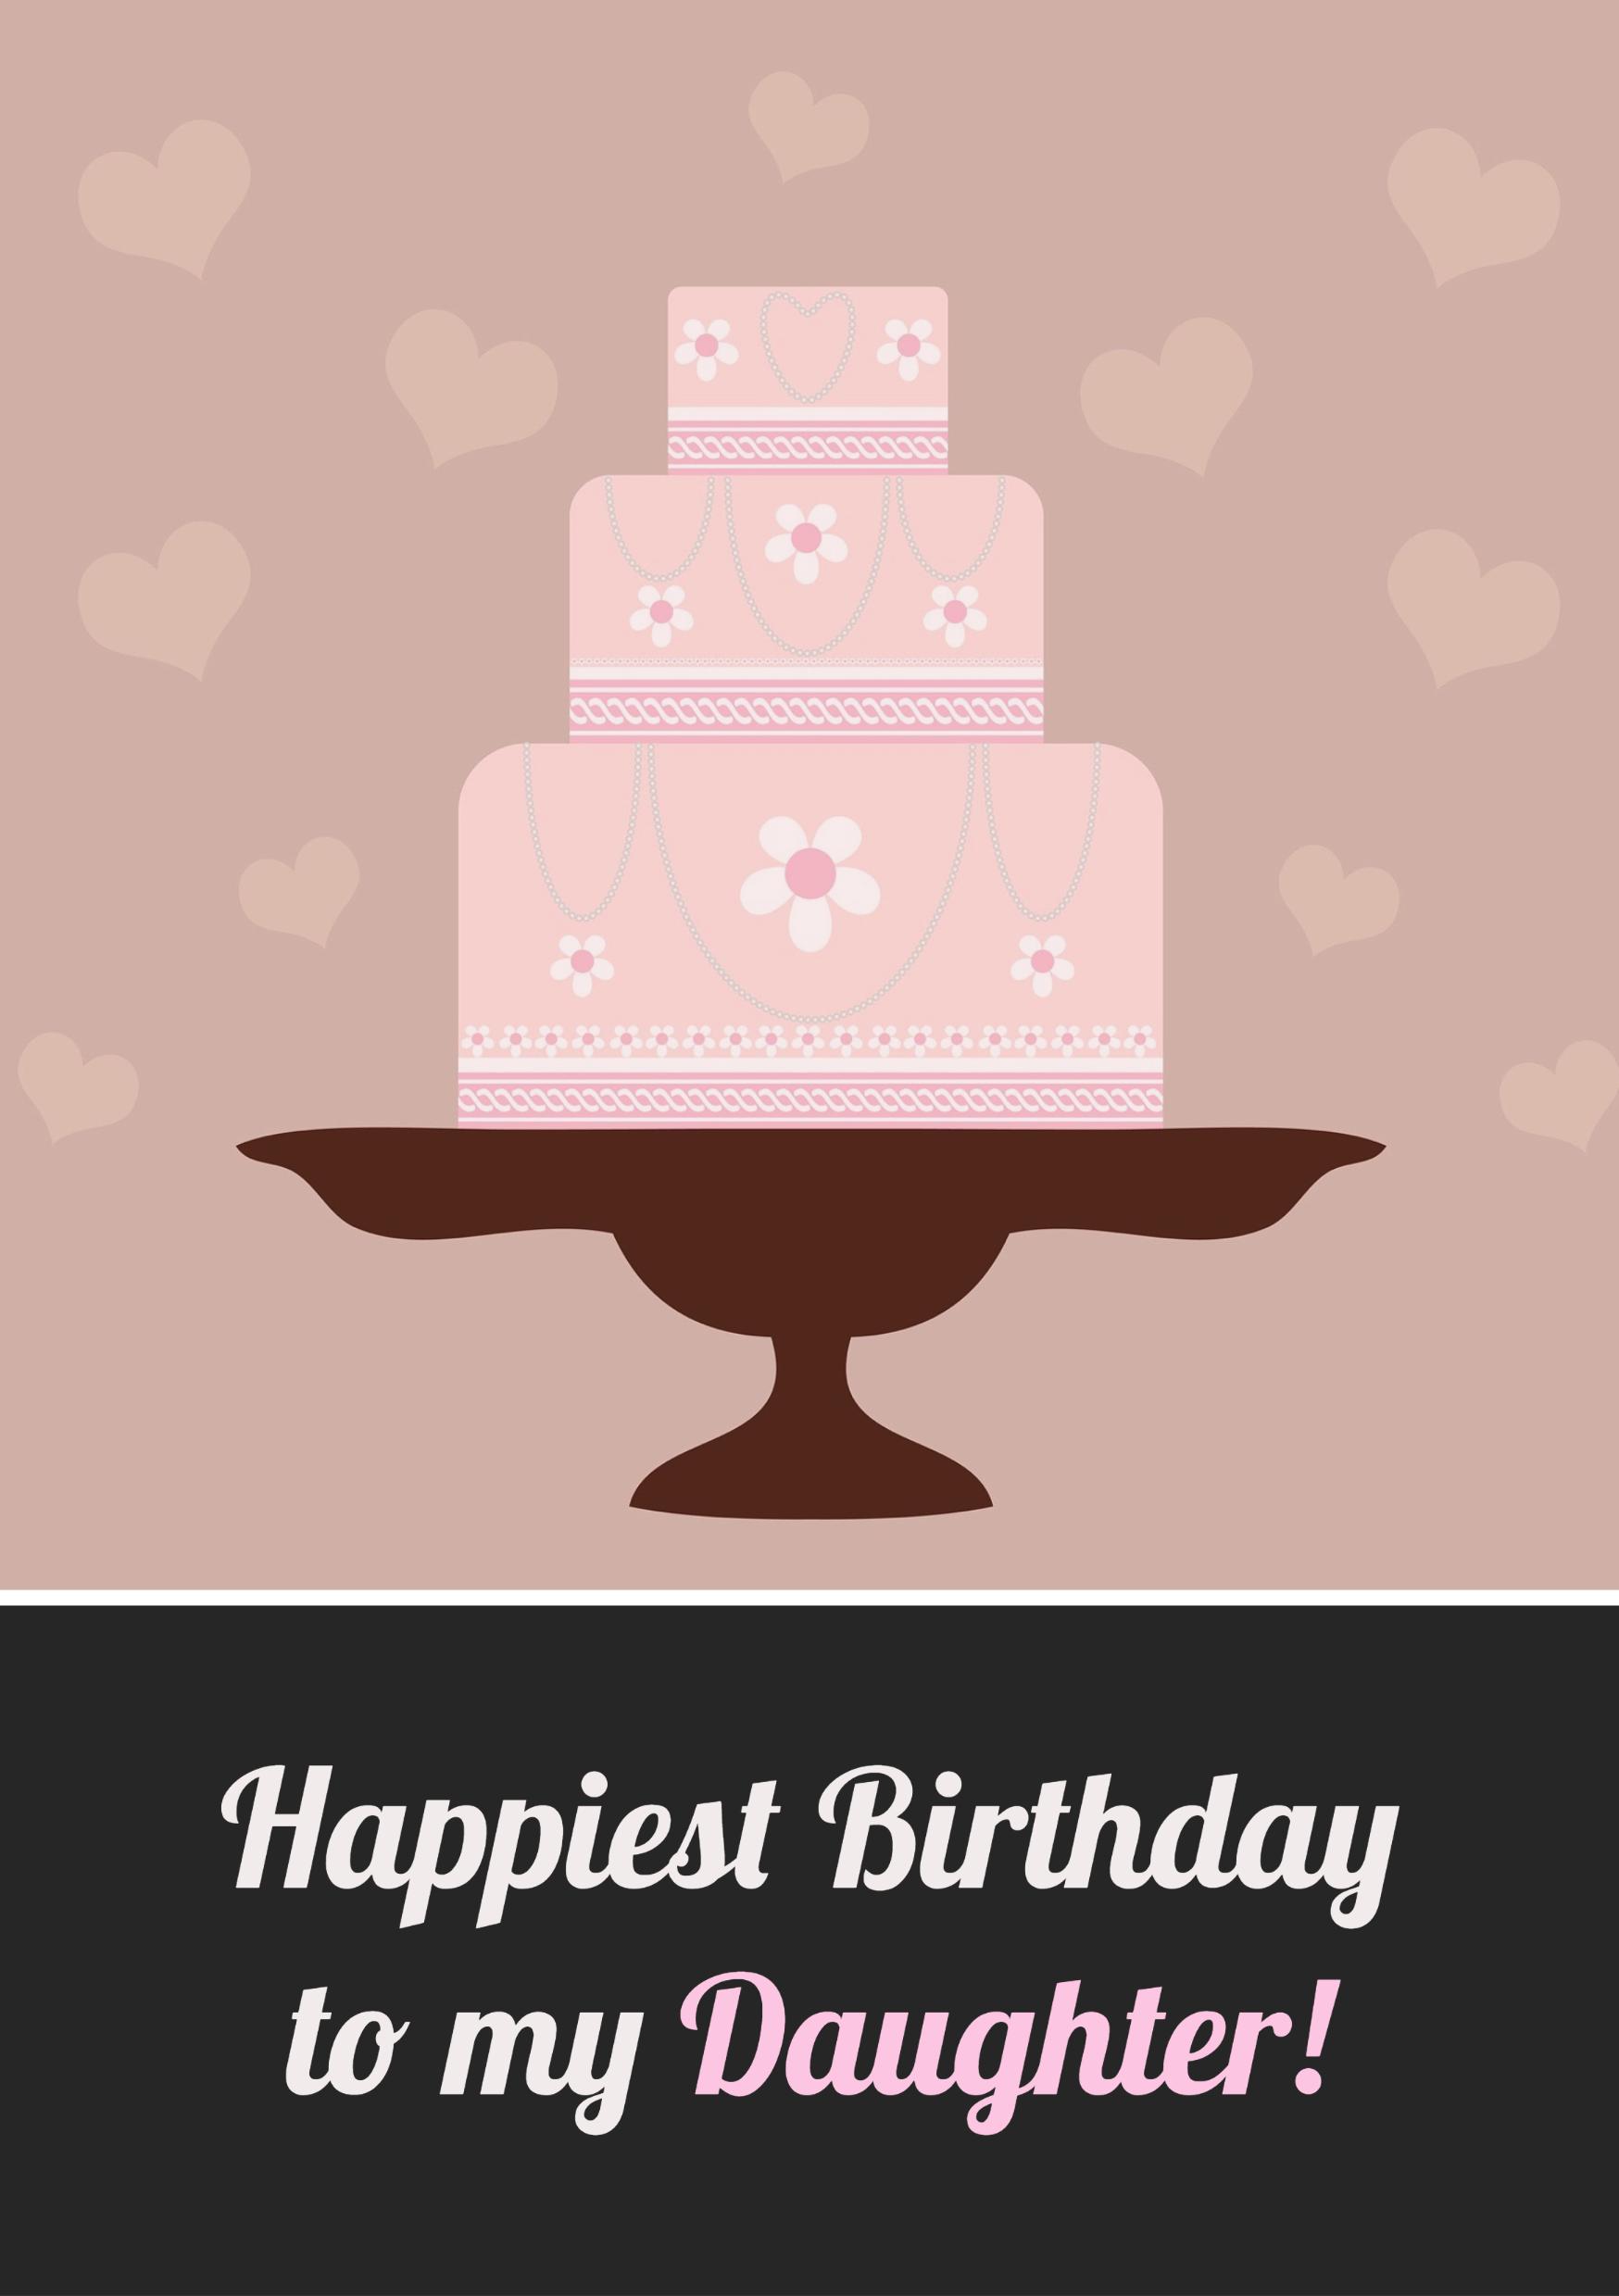 Diy Happy Birthday Card With Templates Free Online Birthday Cards Birthday Card Template Online Birthday Card Maker